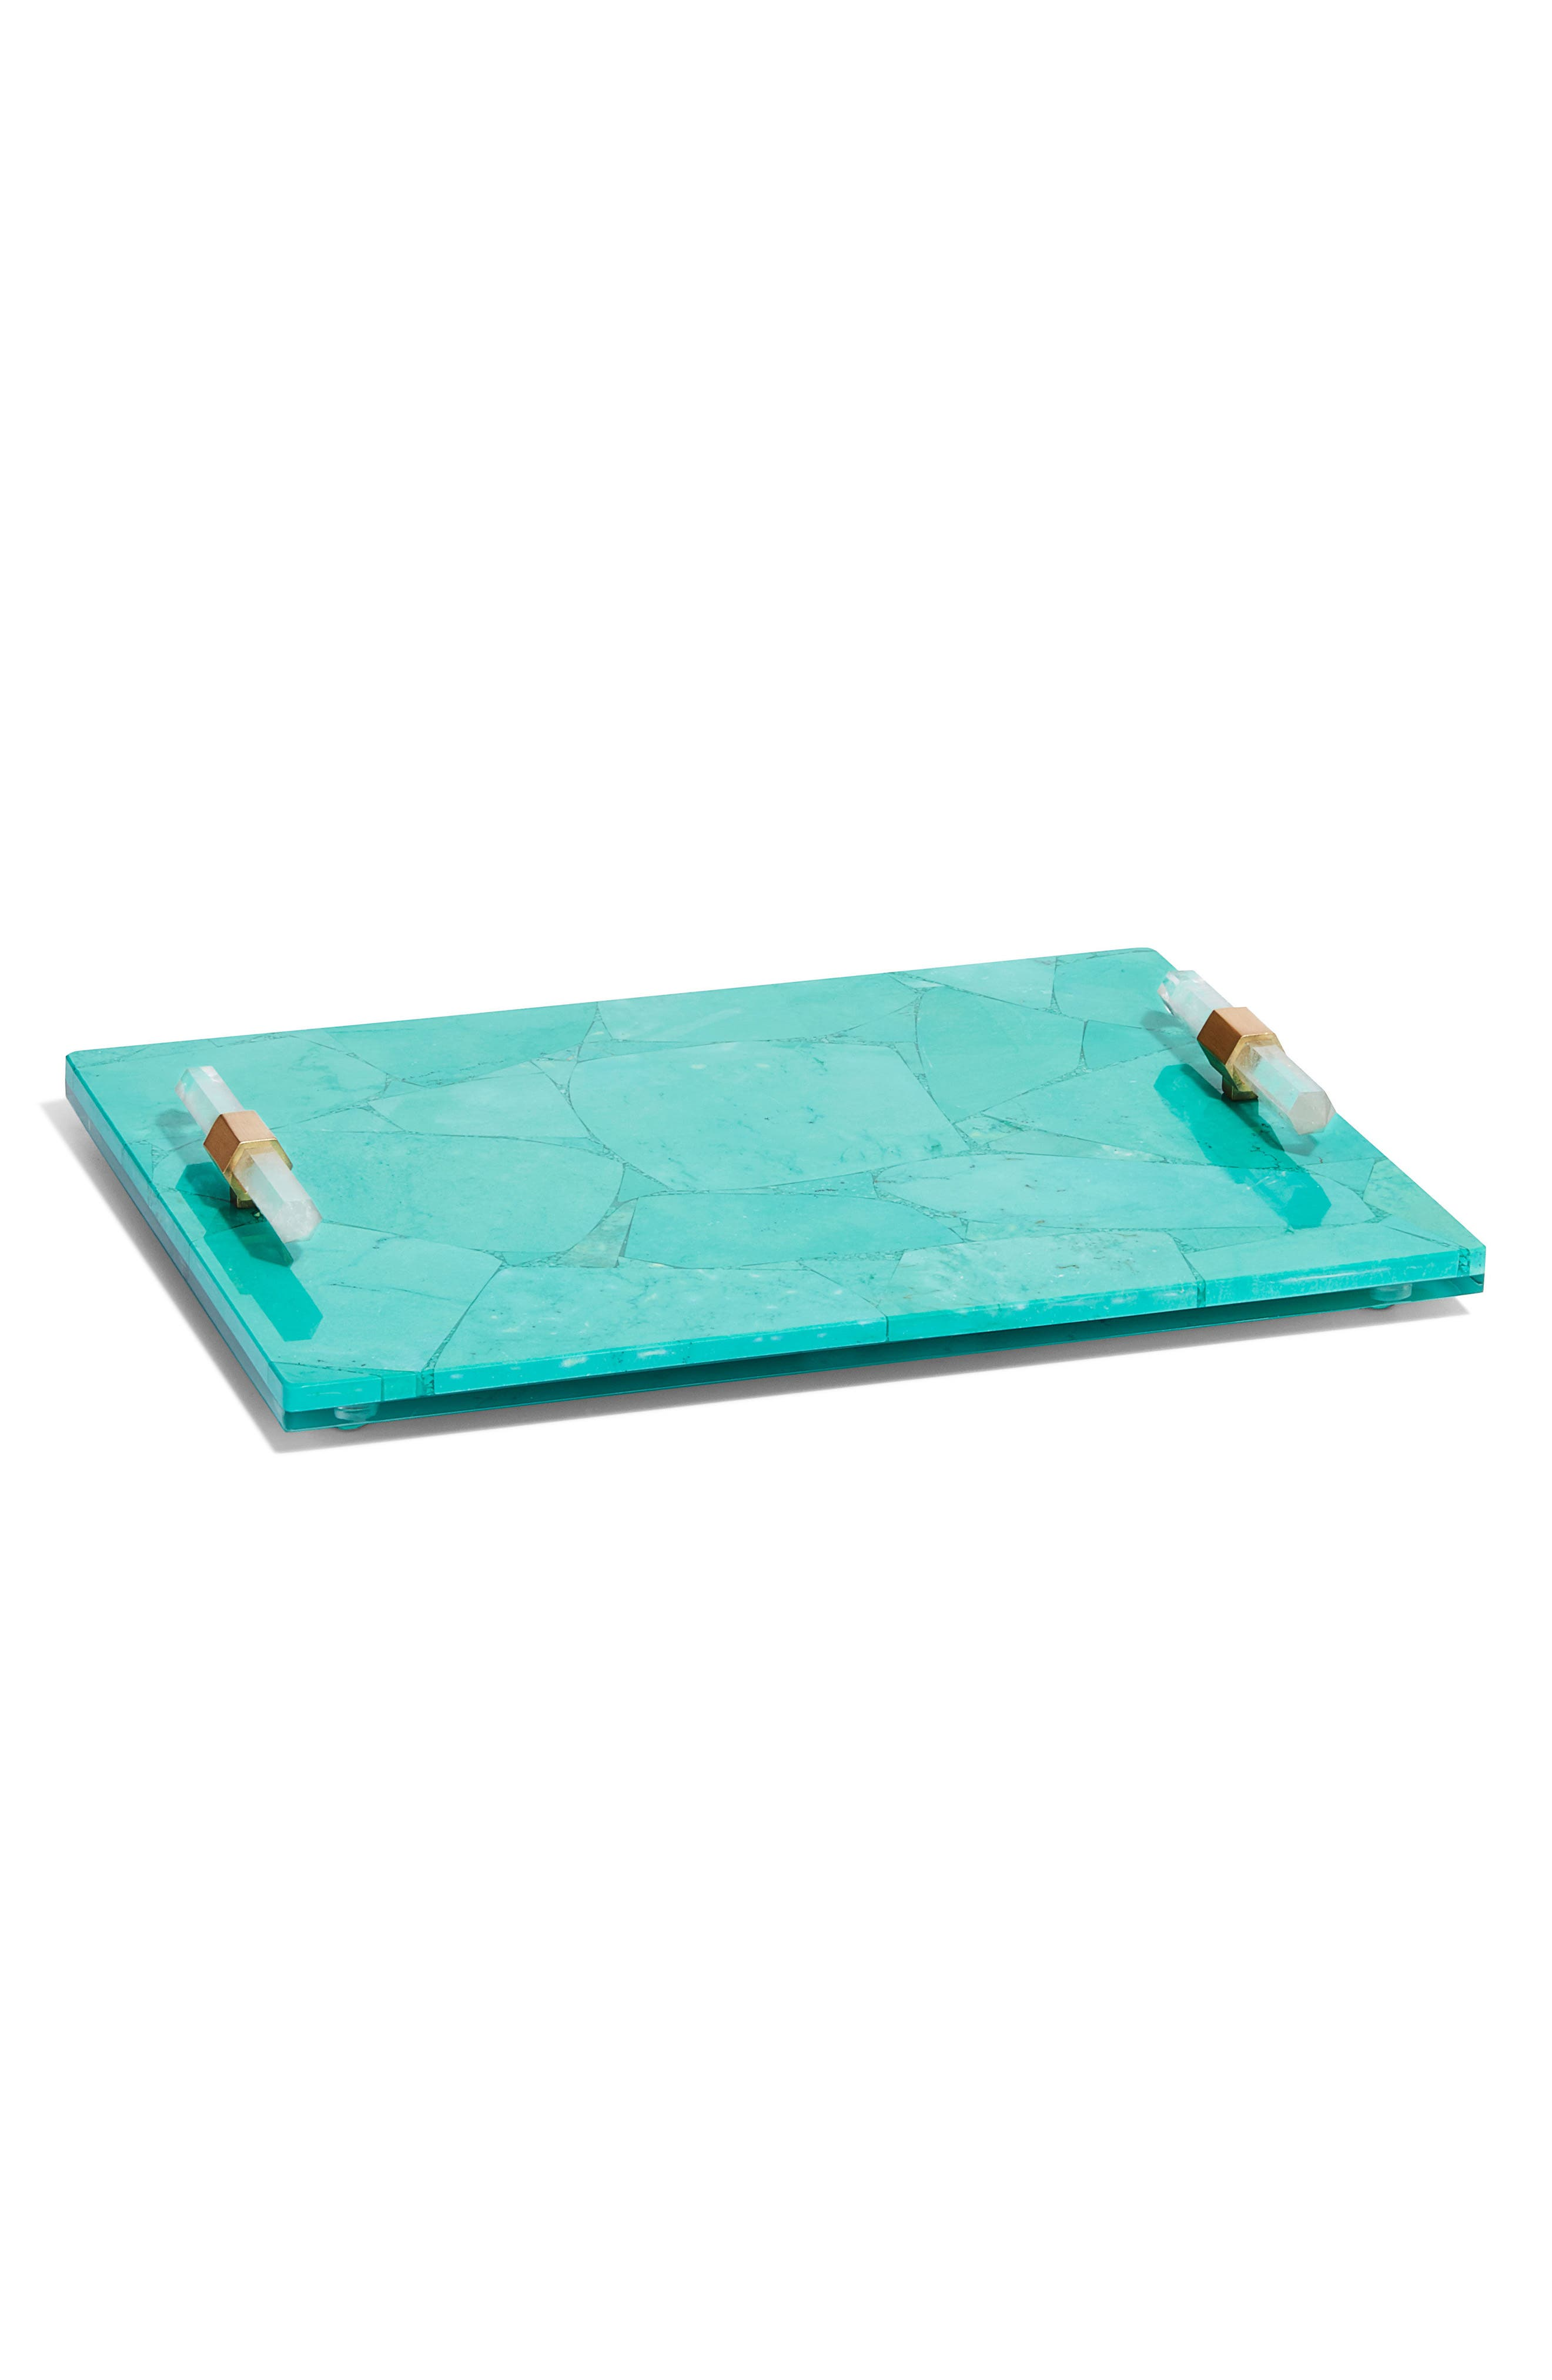 Alternate Image 1 Selected - Kendra Scott Small Stone Slab Tray